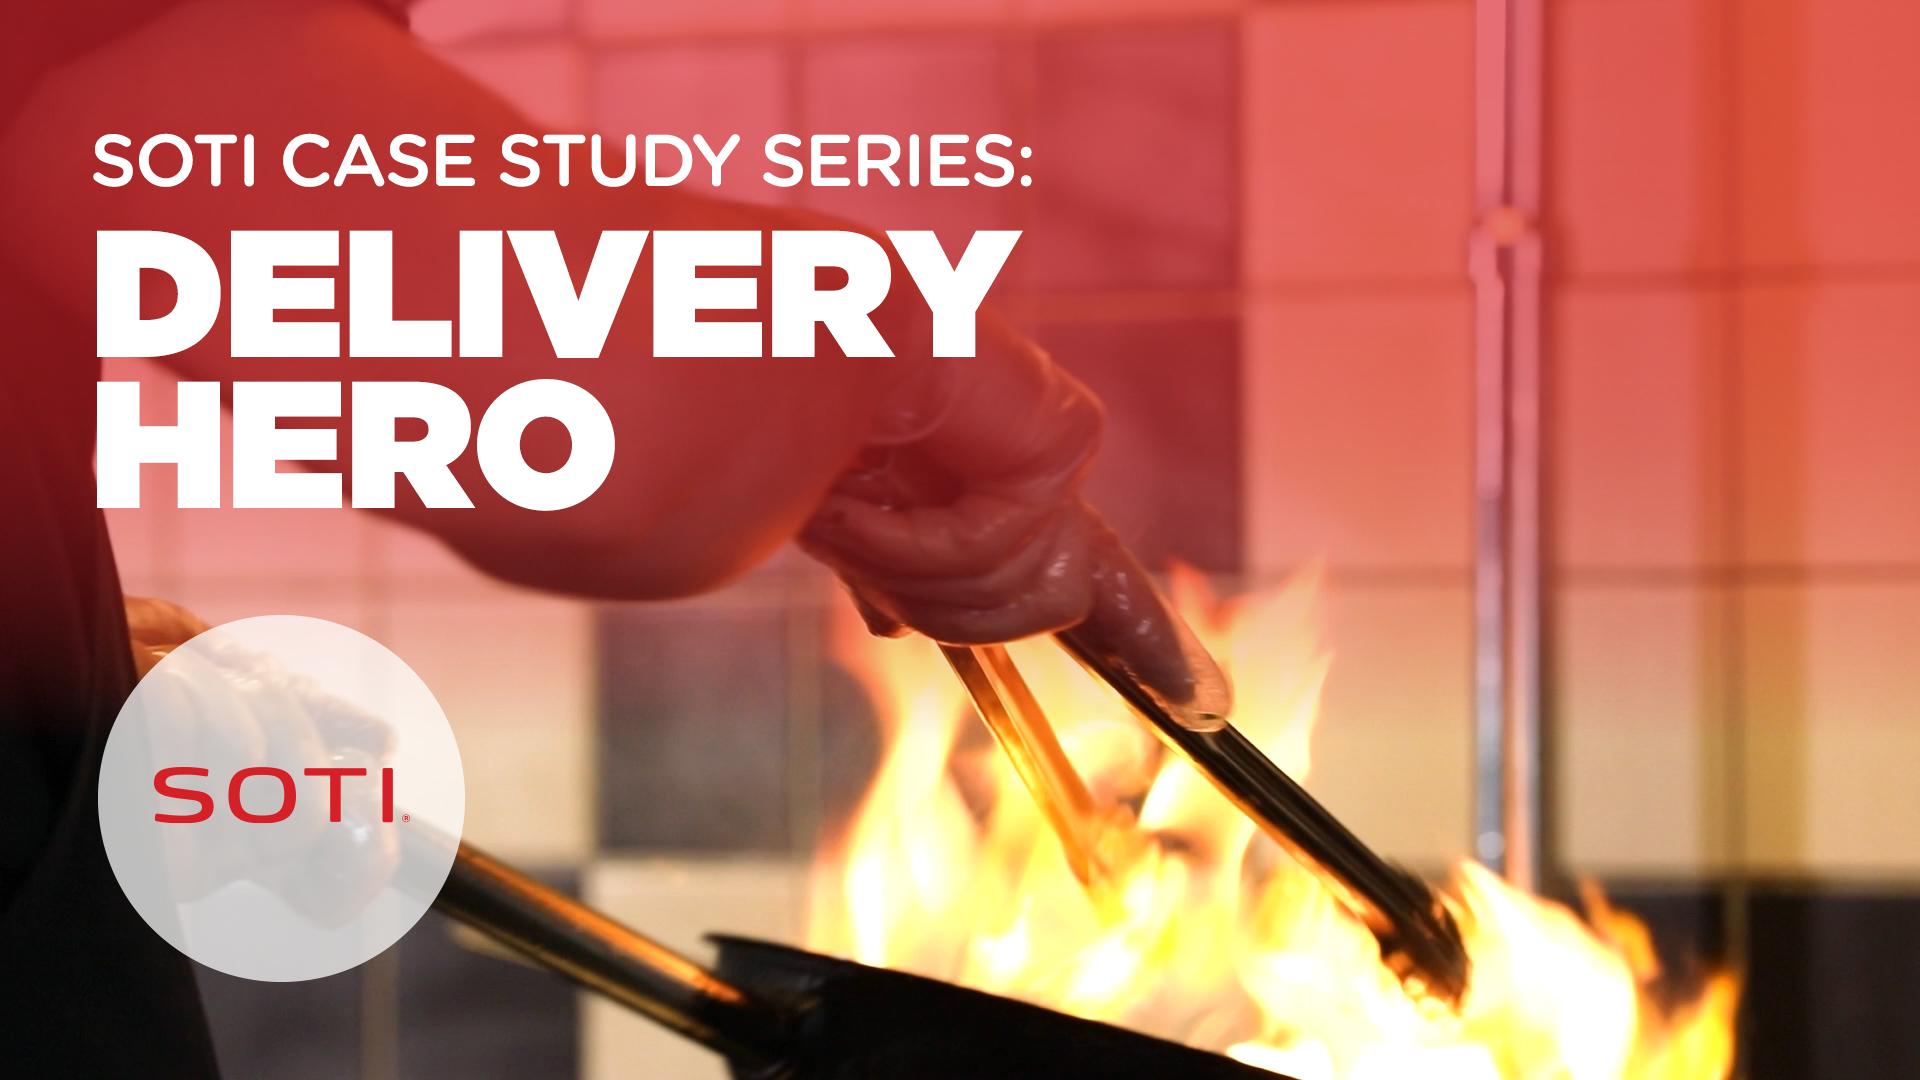 SOTI Case Study Series: Delivery Hero video